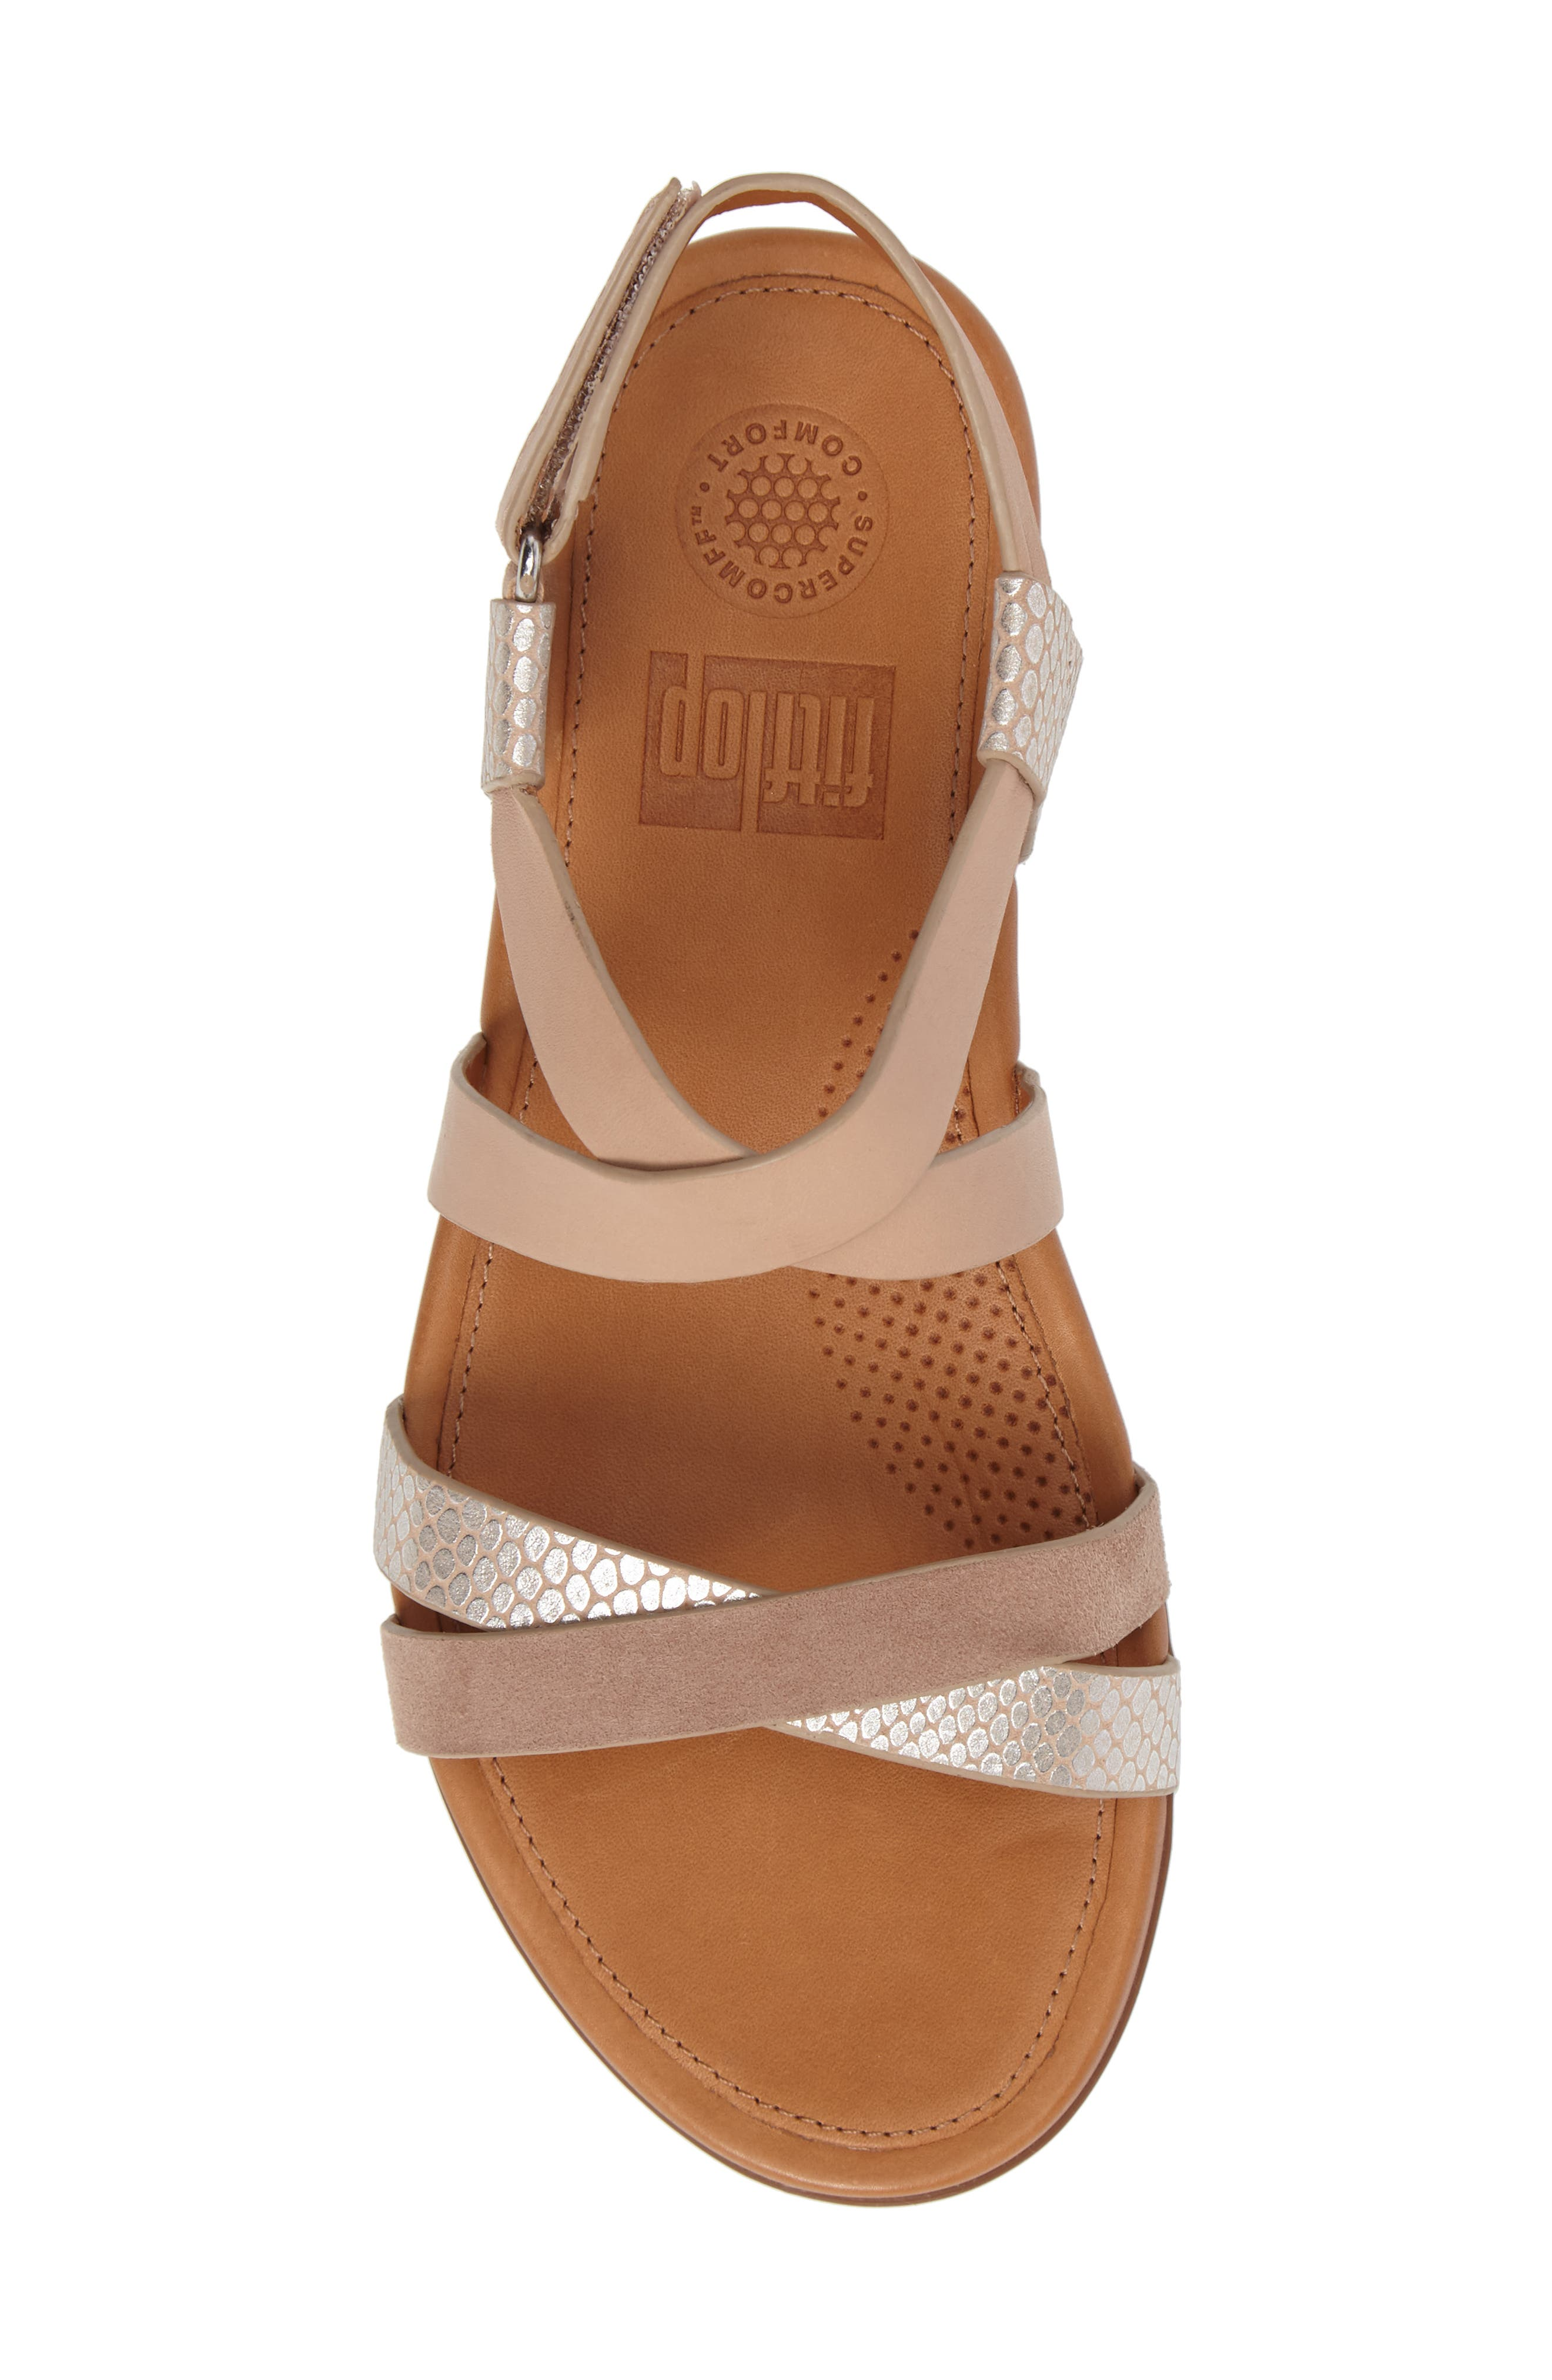 Lumy Crisscross Sandal,                             Alternate thumbnail 5, color,                             Peachy/ Silver Snake Suede